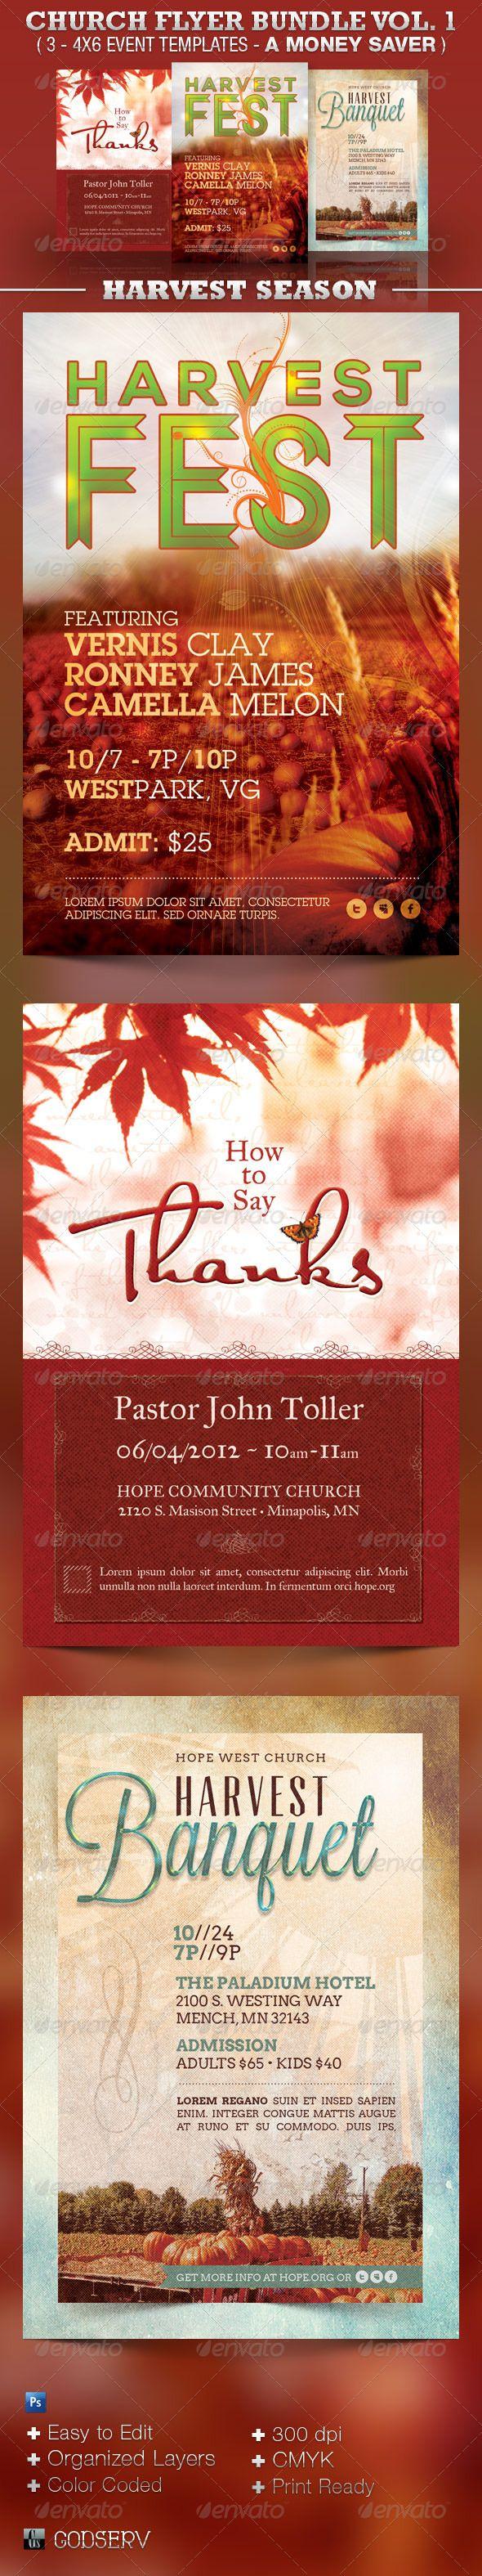 17 best images about church print samples program church flyer template bundle vol 1 harvest 12 00